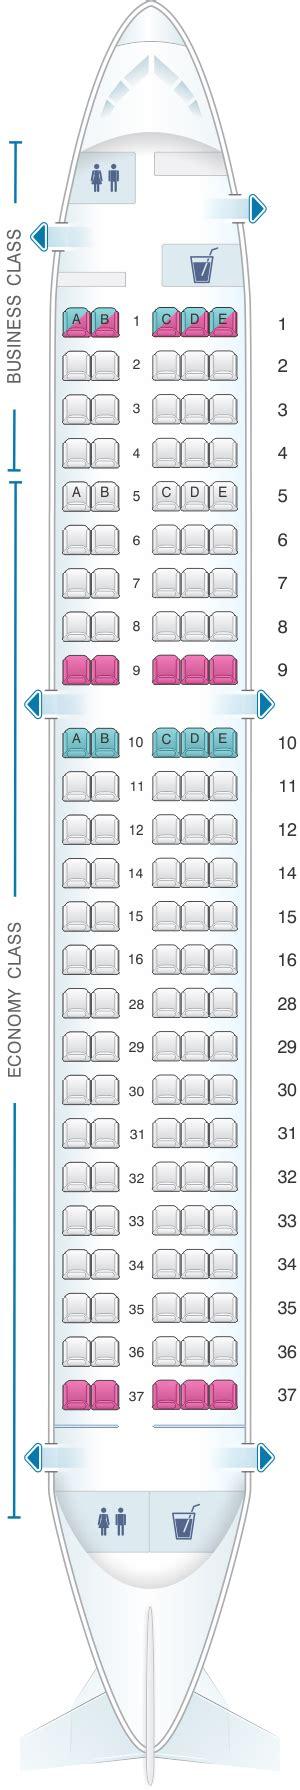 swiss air choose seats seat map swiss bombardier cs100 seatmaestro